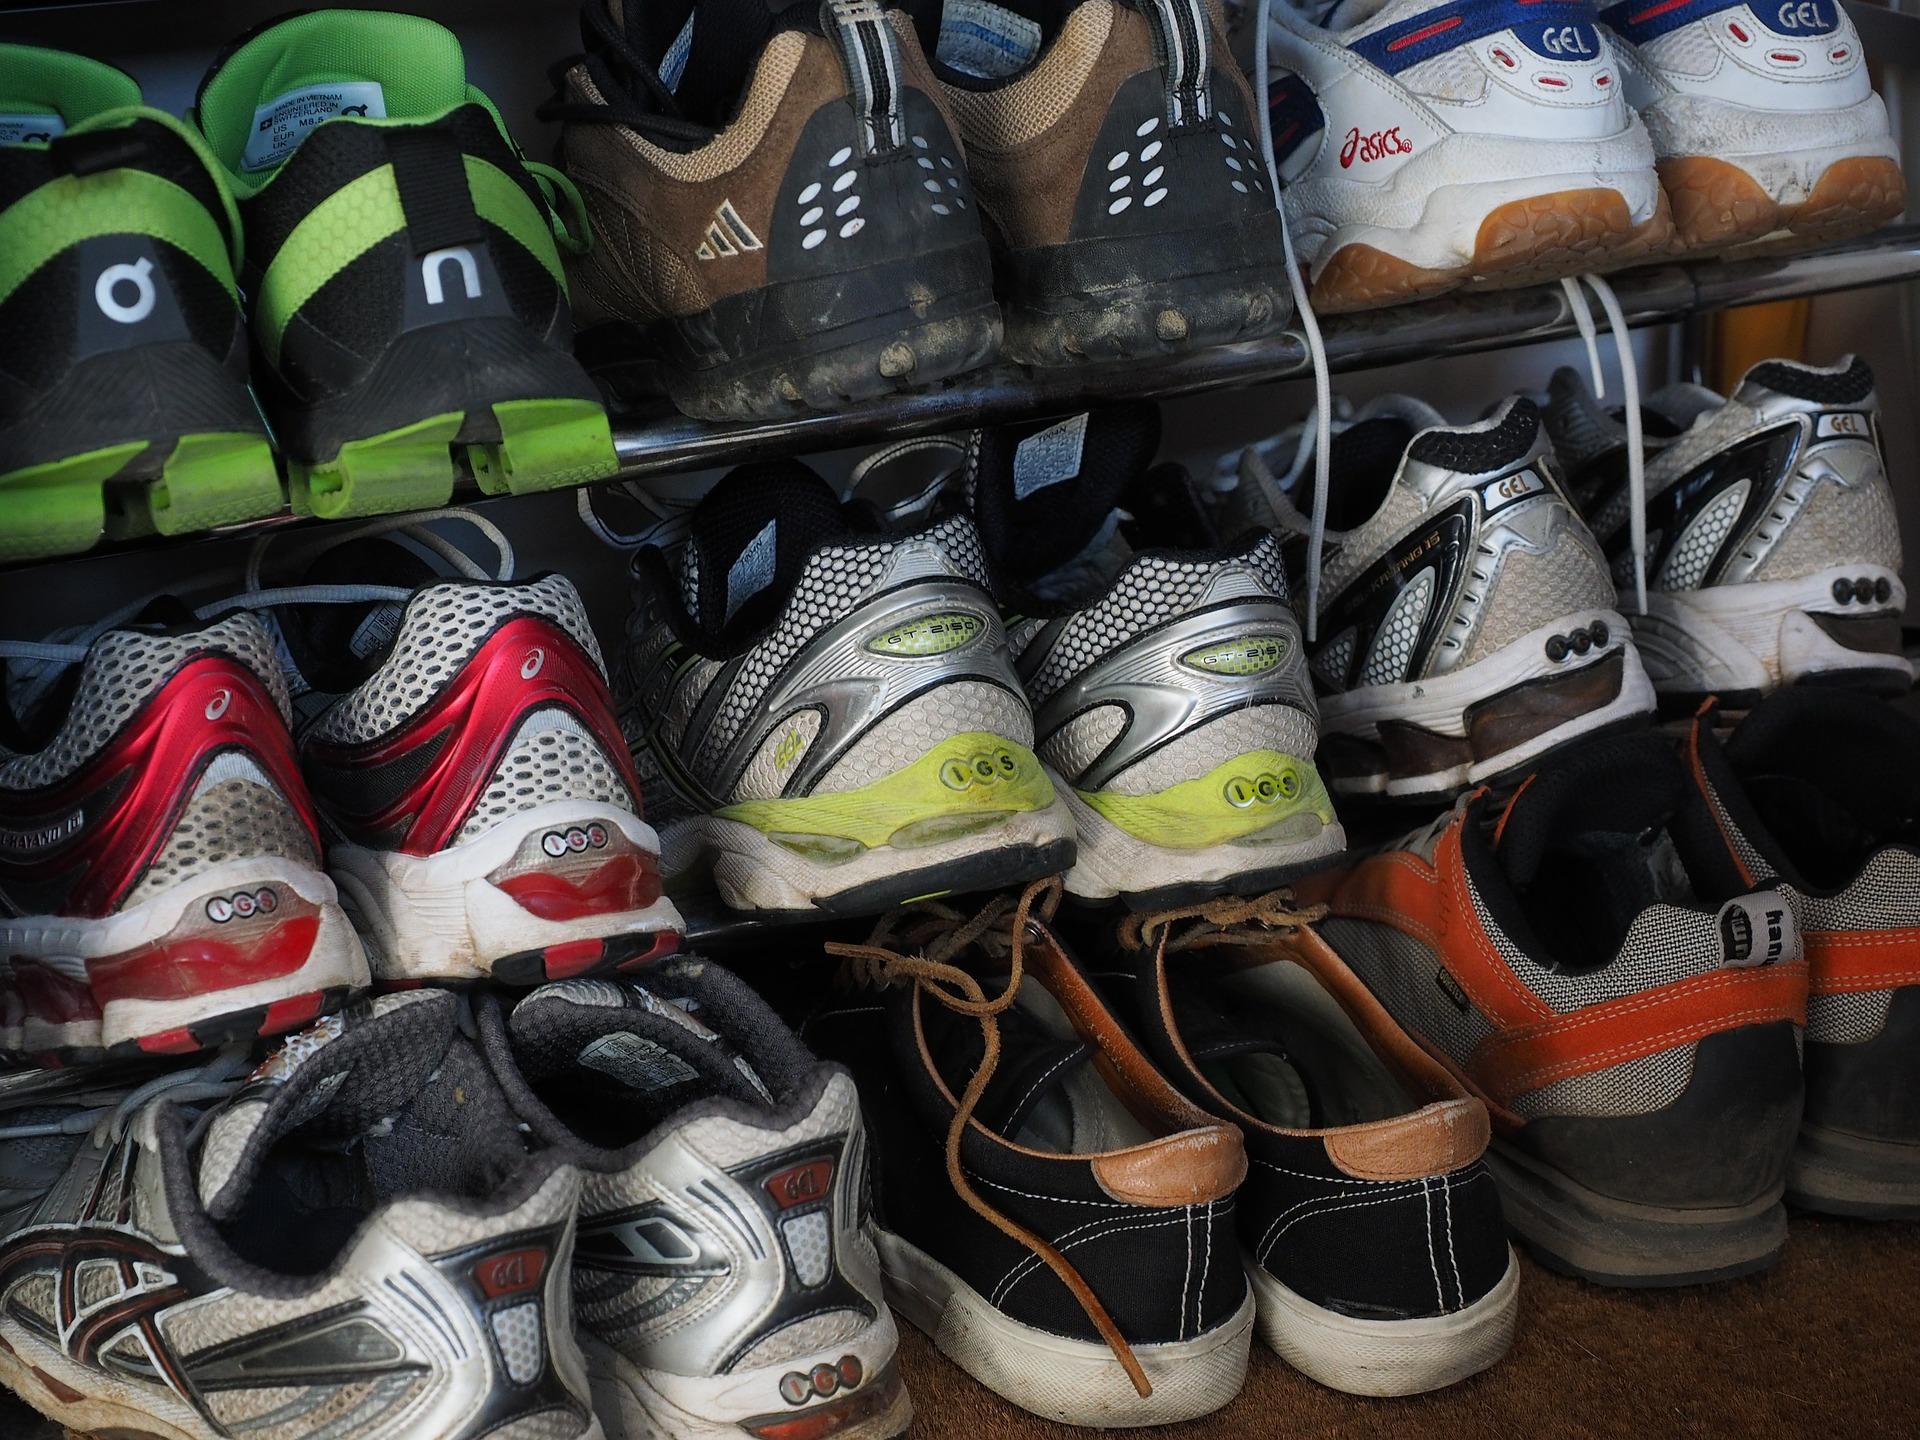 Footwear and Form workshop – 18th July